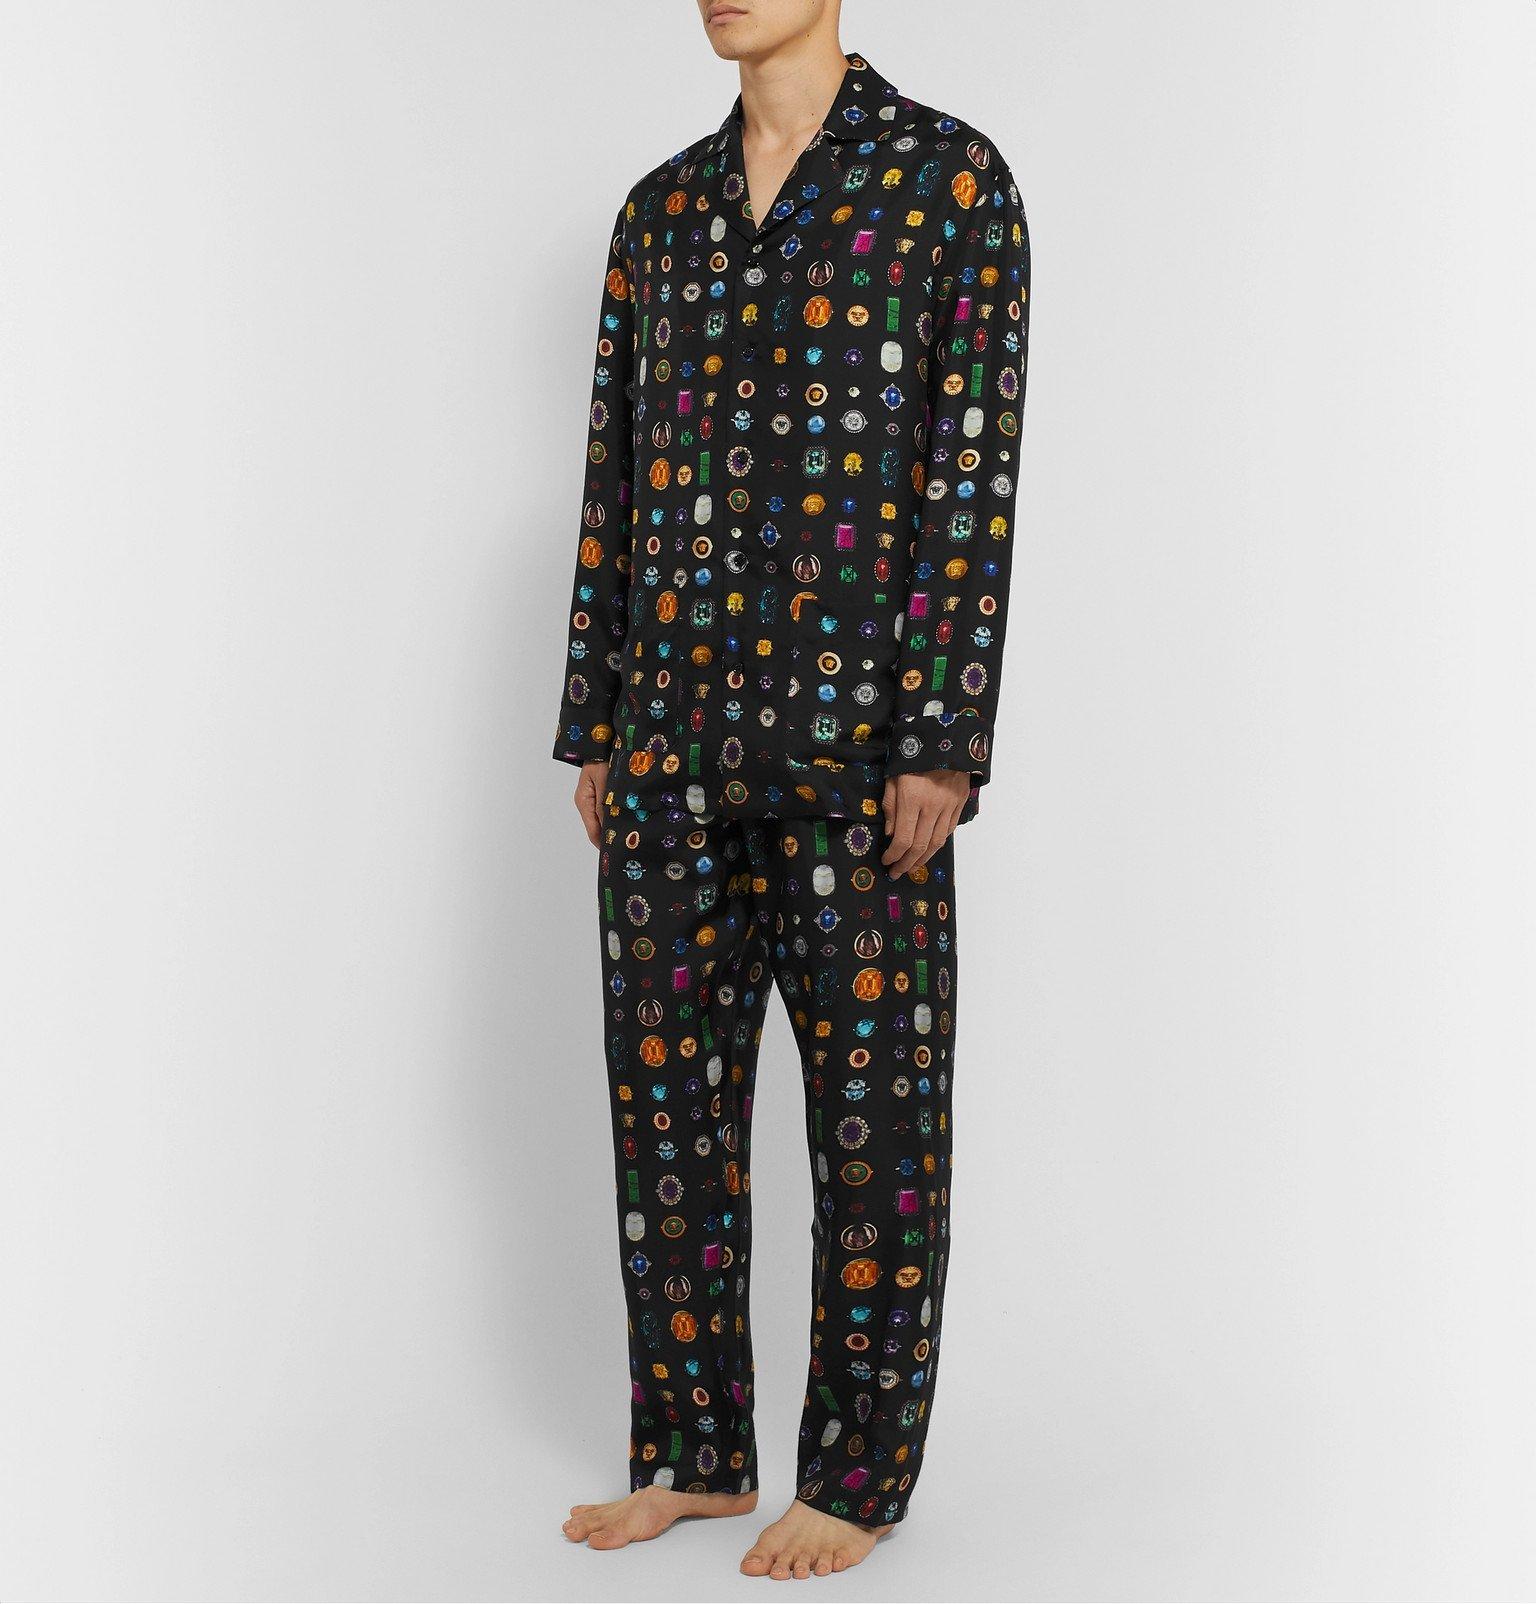 Versace - Printed Silk-Twill Pyjama Trousers - Black